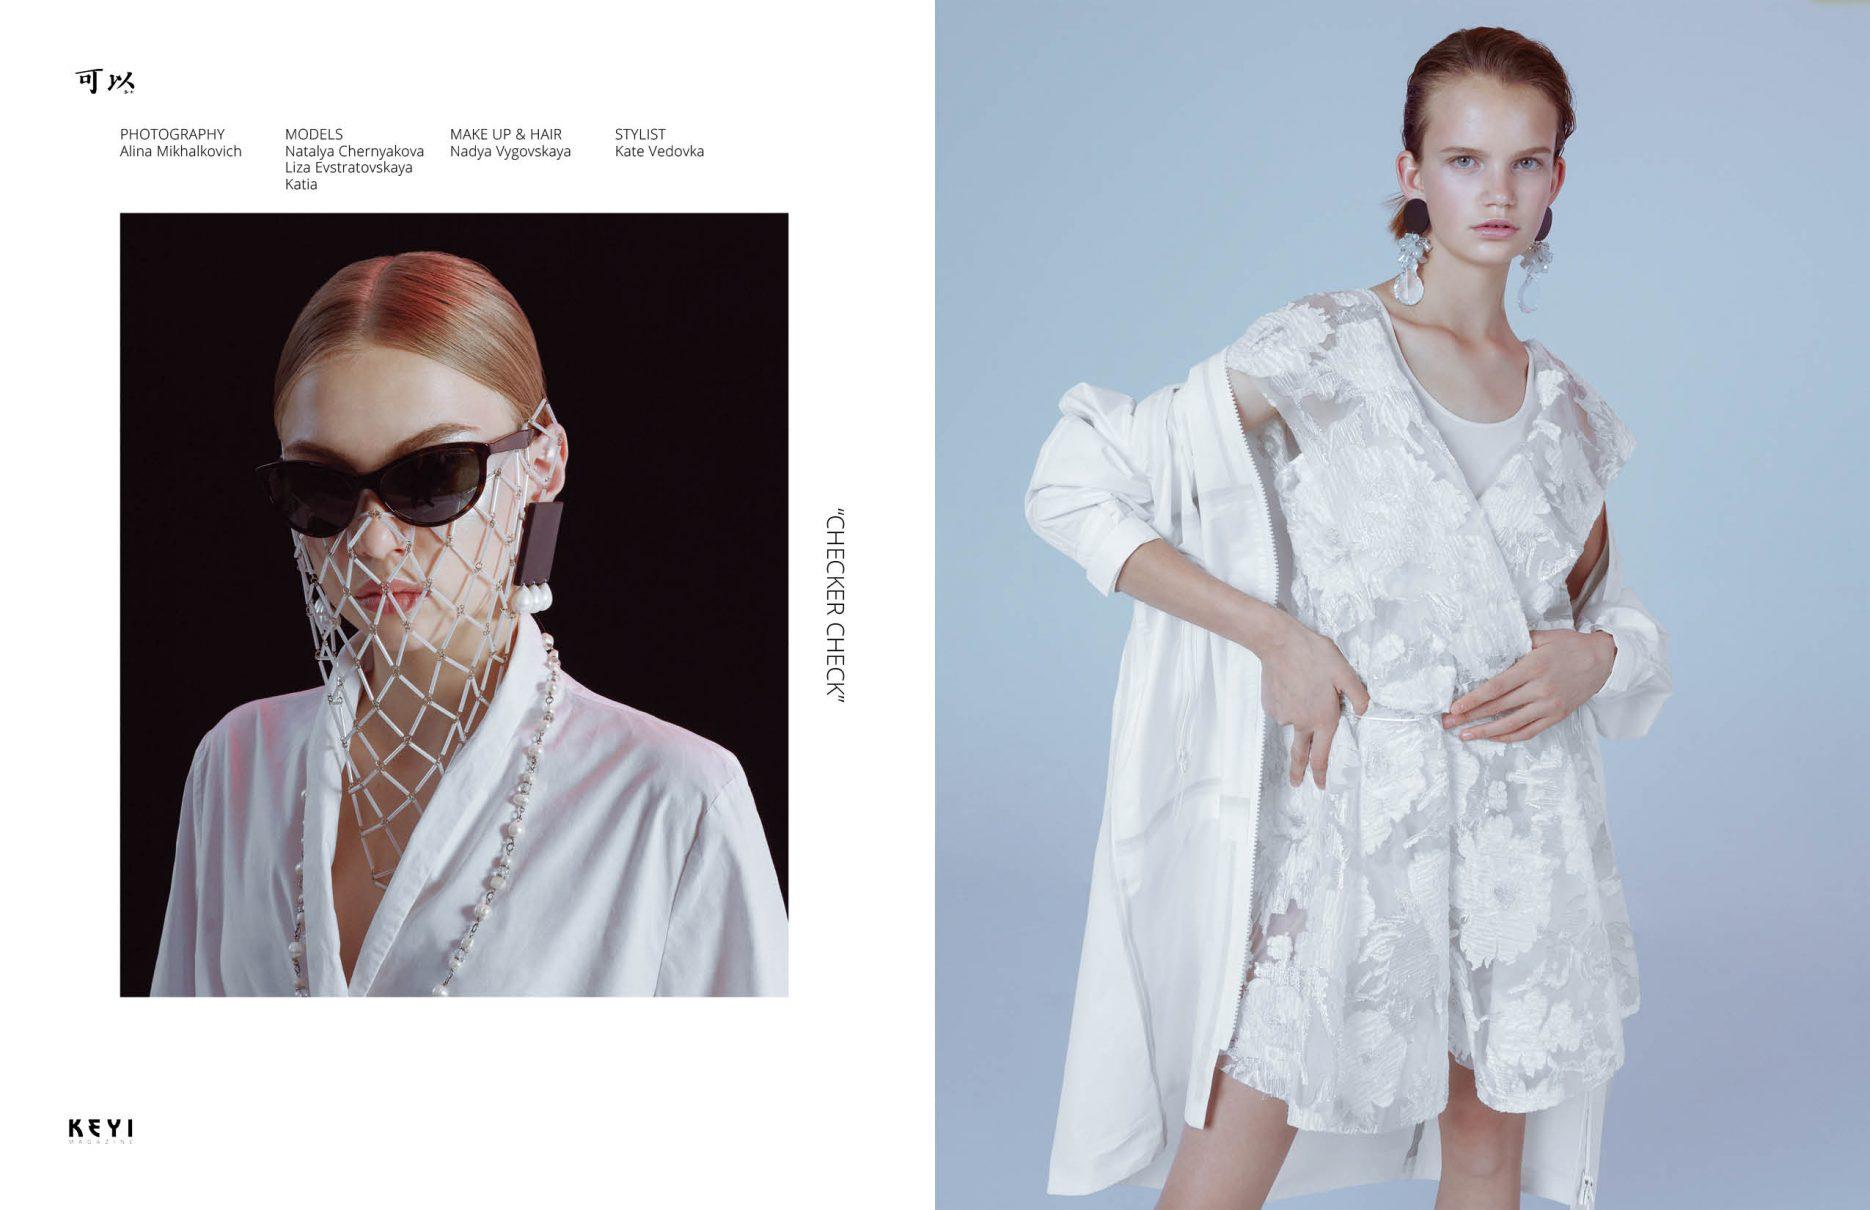 photoshoot for keyi magazine berlin